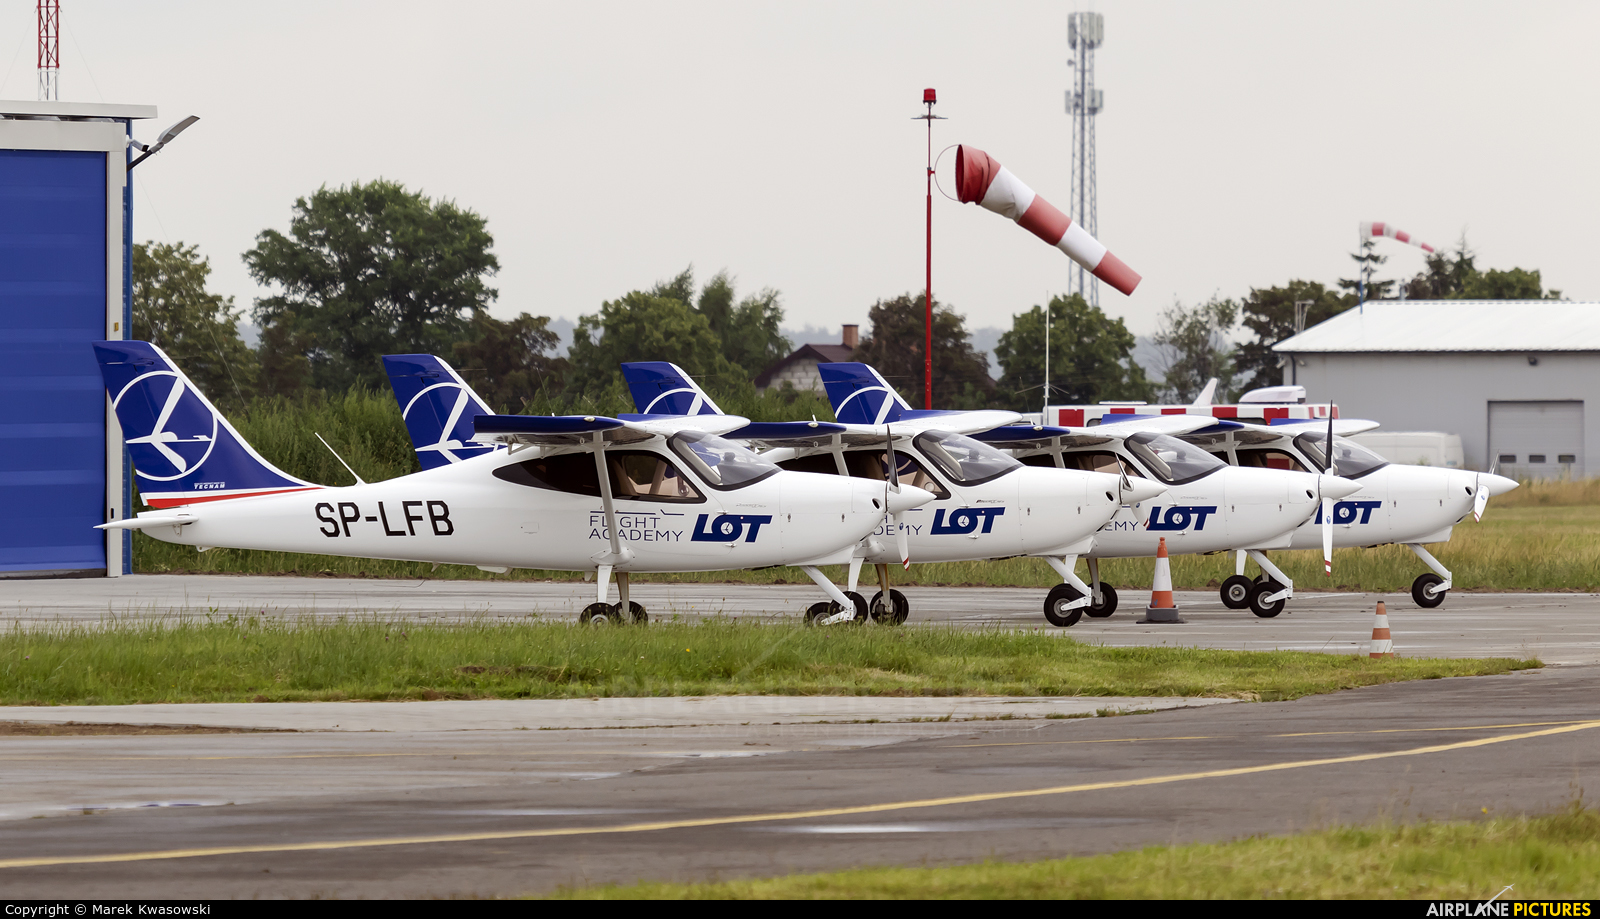 LOT Flight Academy SP-LFB aircraft at Piotrków Trybunalski